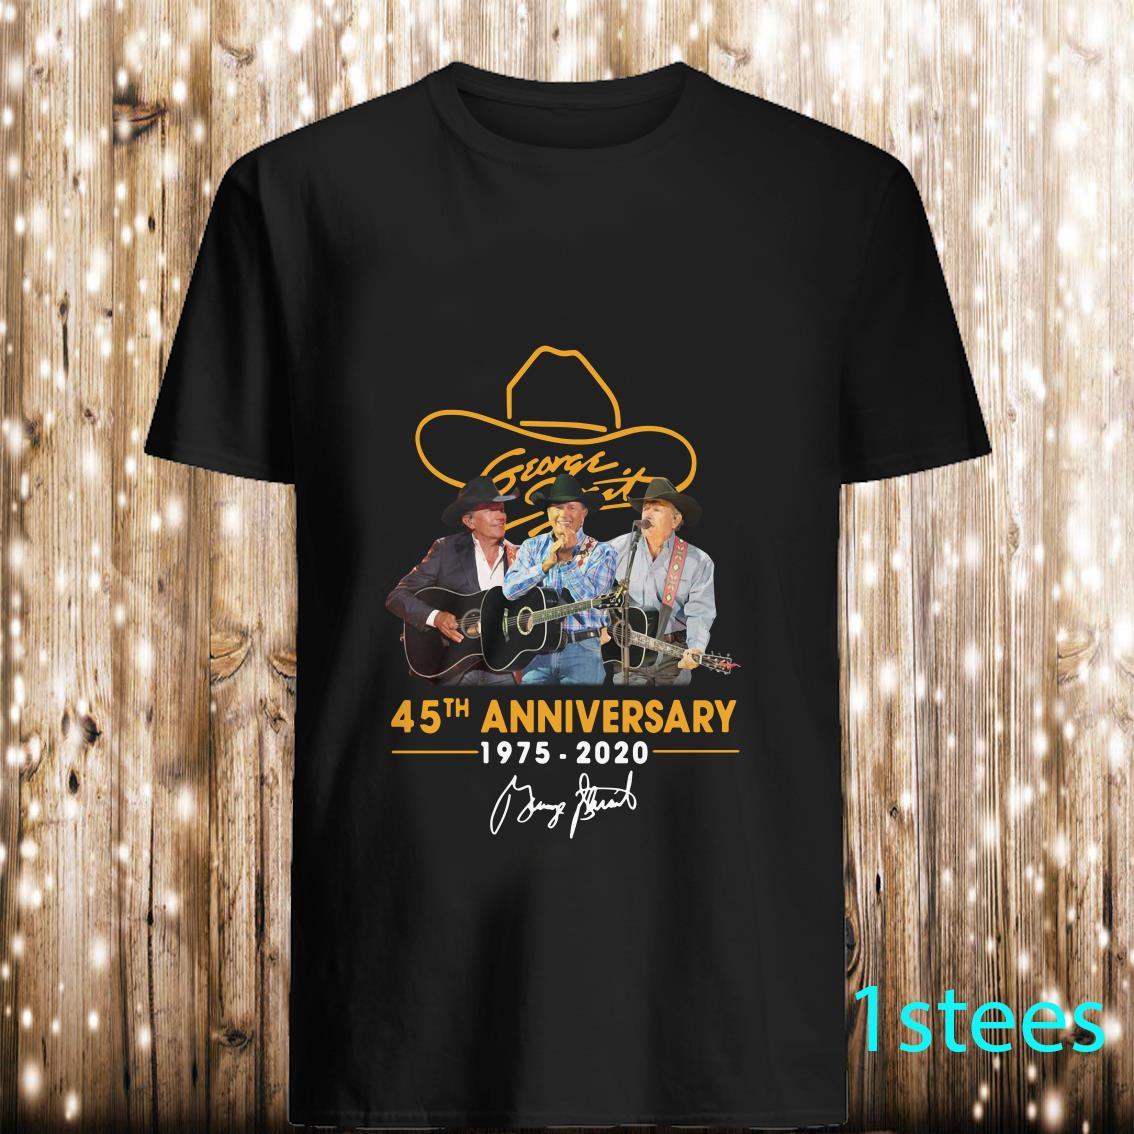 George Strait 25th Anniversary 1975-2020 Signatures Shirt